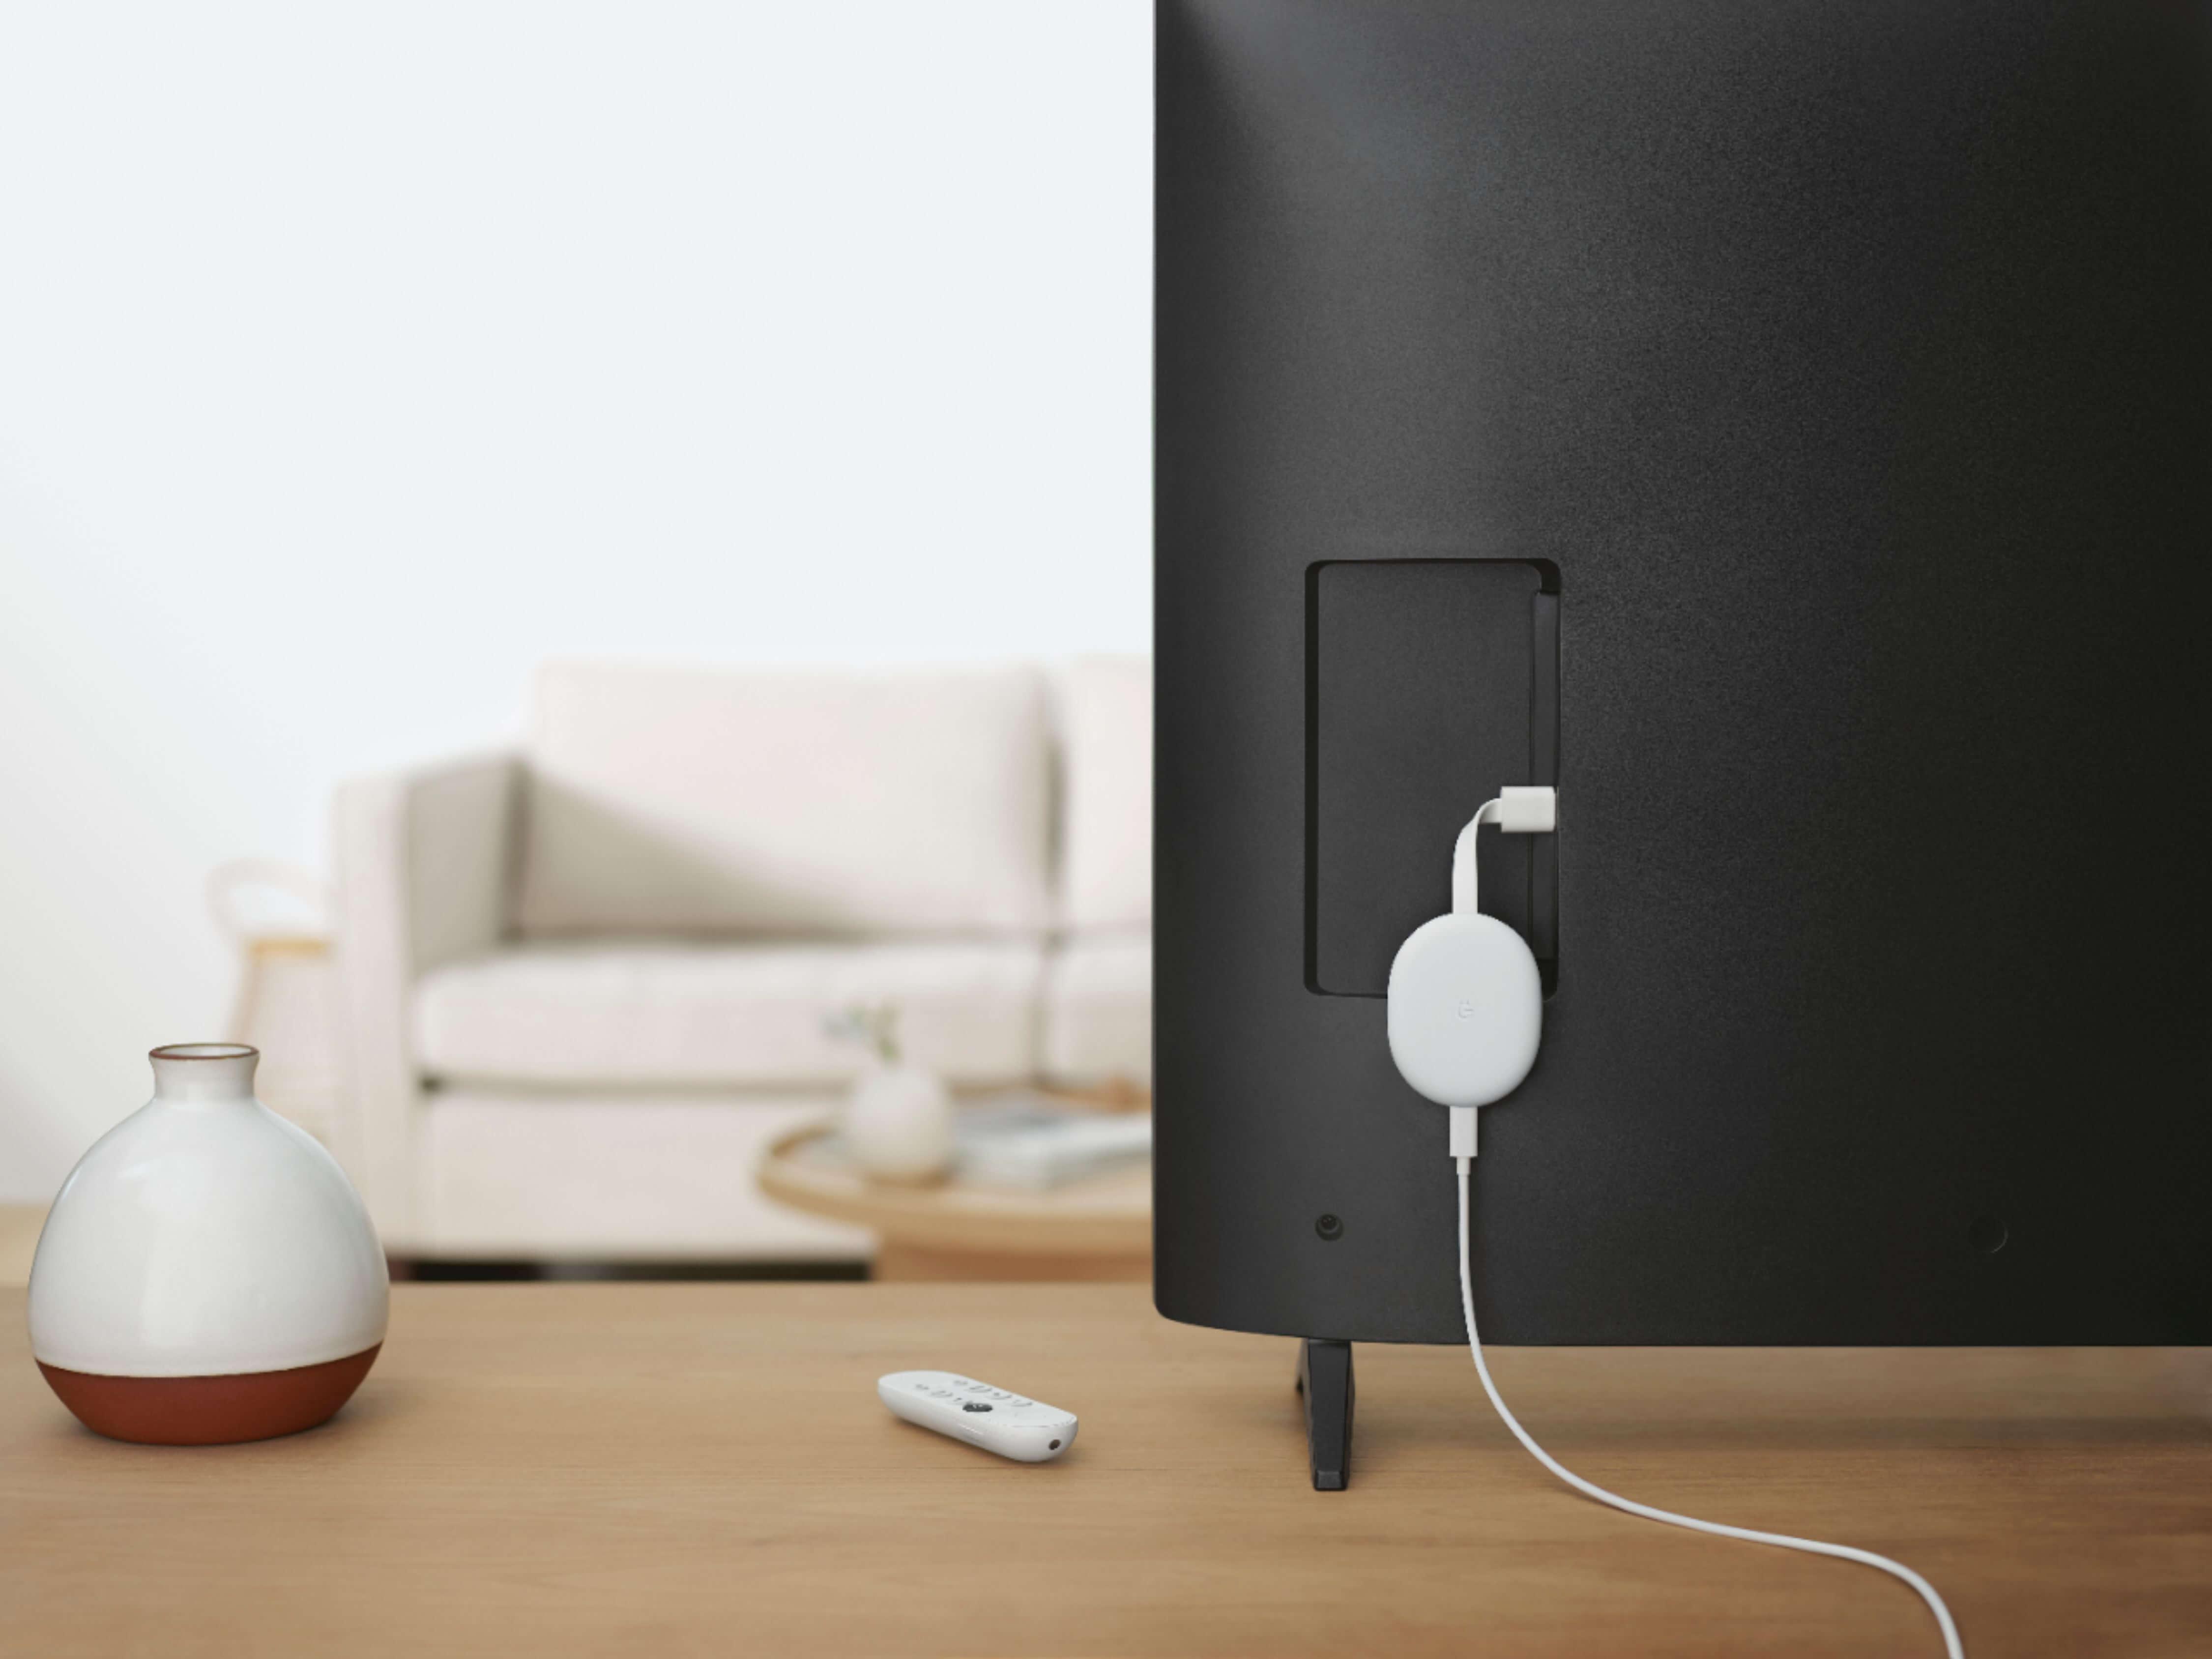 Google Chromecast 4k with Google TV